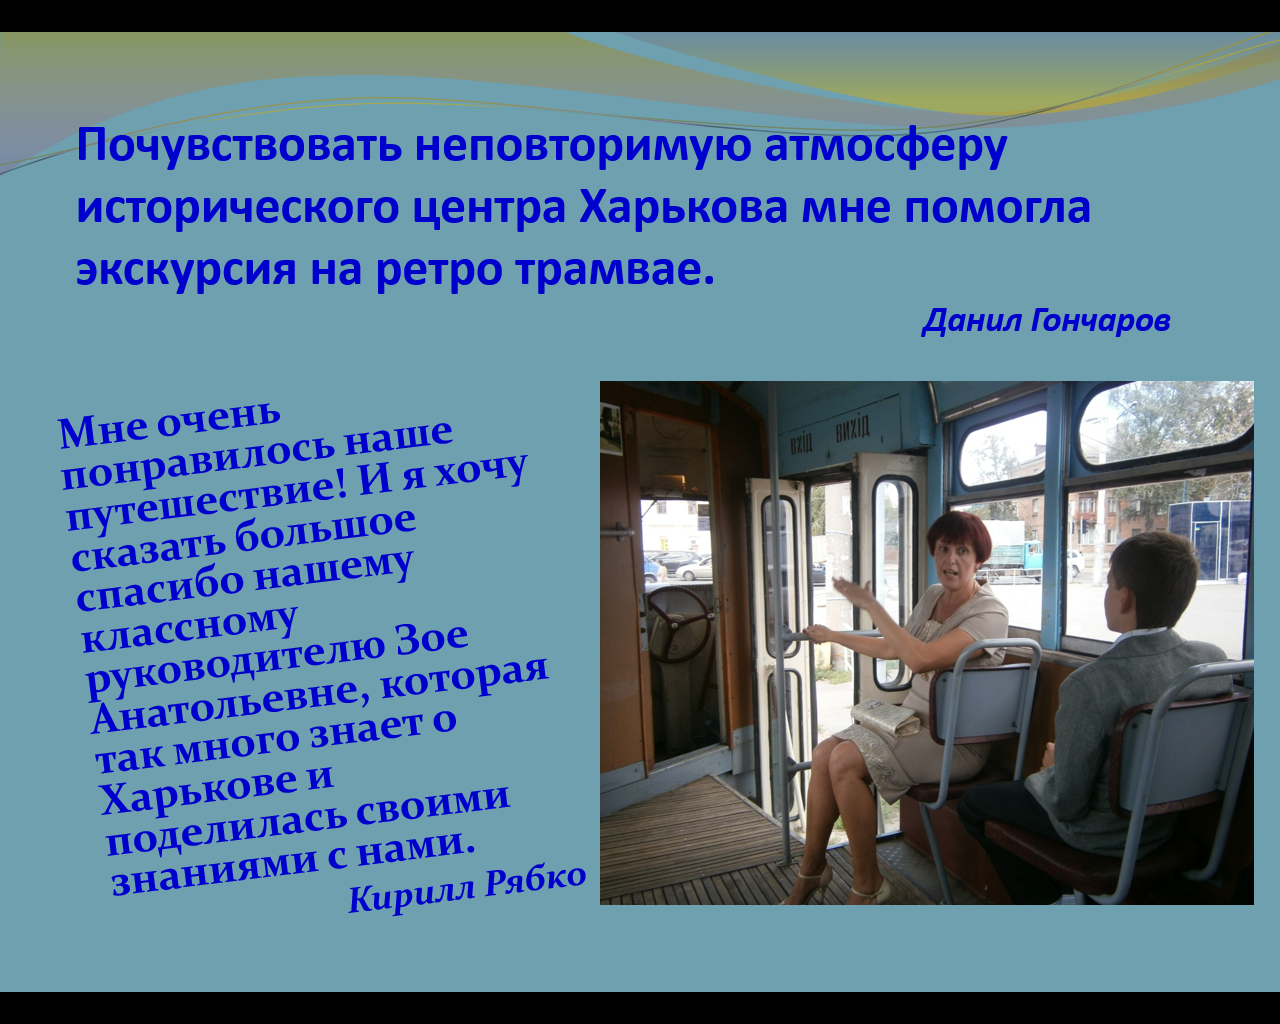 hello_html_m9db727.png